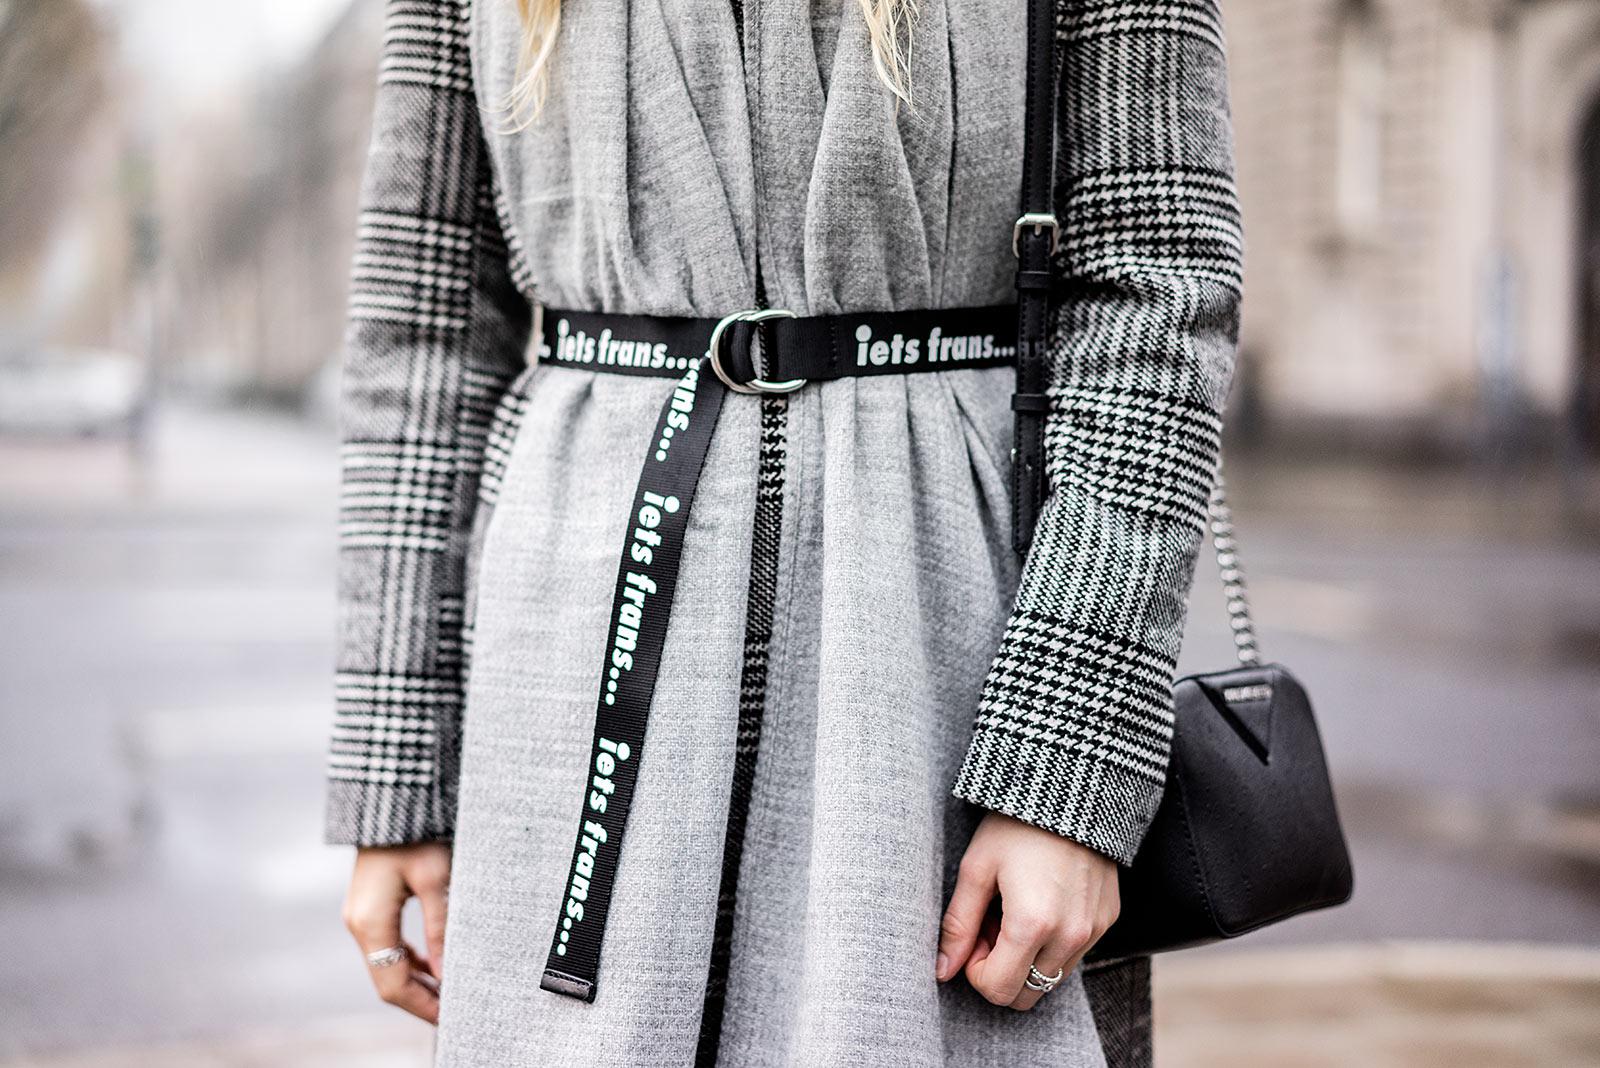 Gürtel über Mantel mit Schriftzug Winter-Accessoires Outfit Sunnyinga